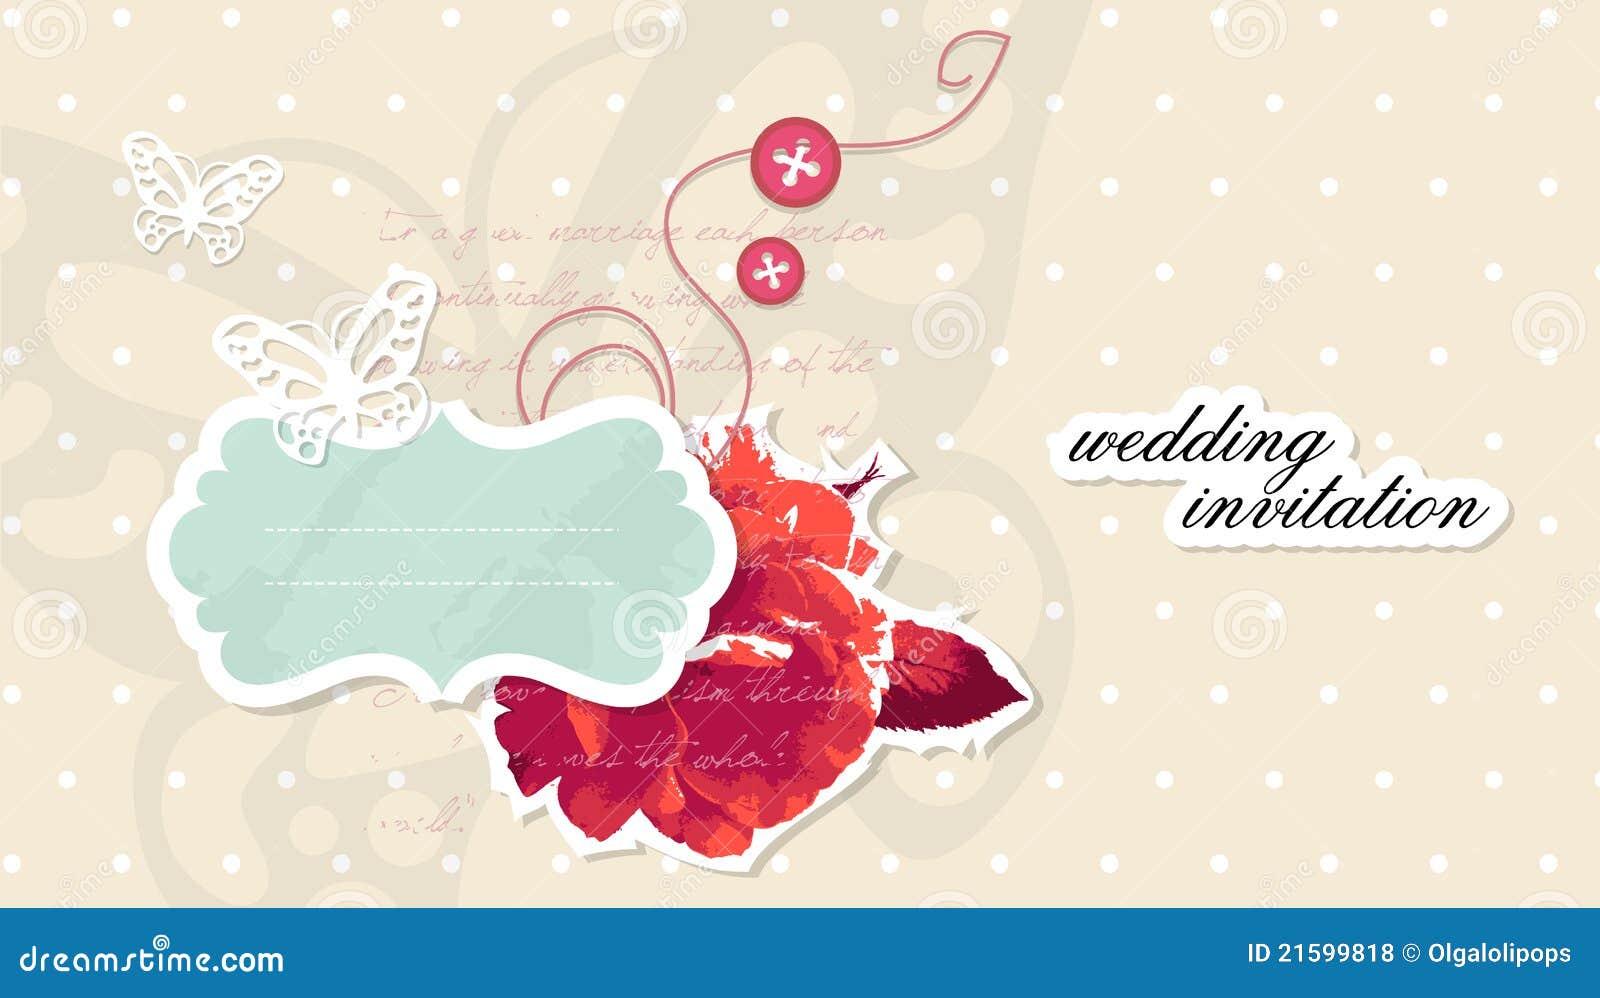 Vector Wedding Invitation Scrapbooking Card Stock Vector ...